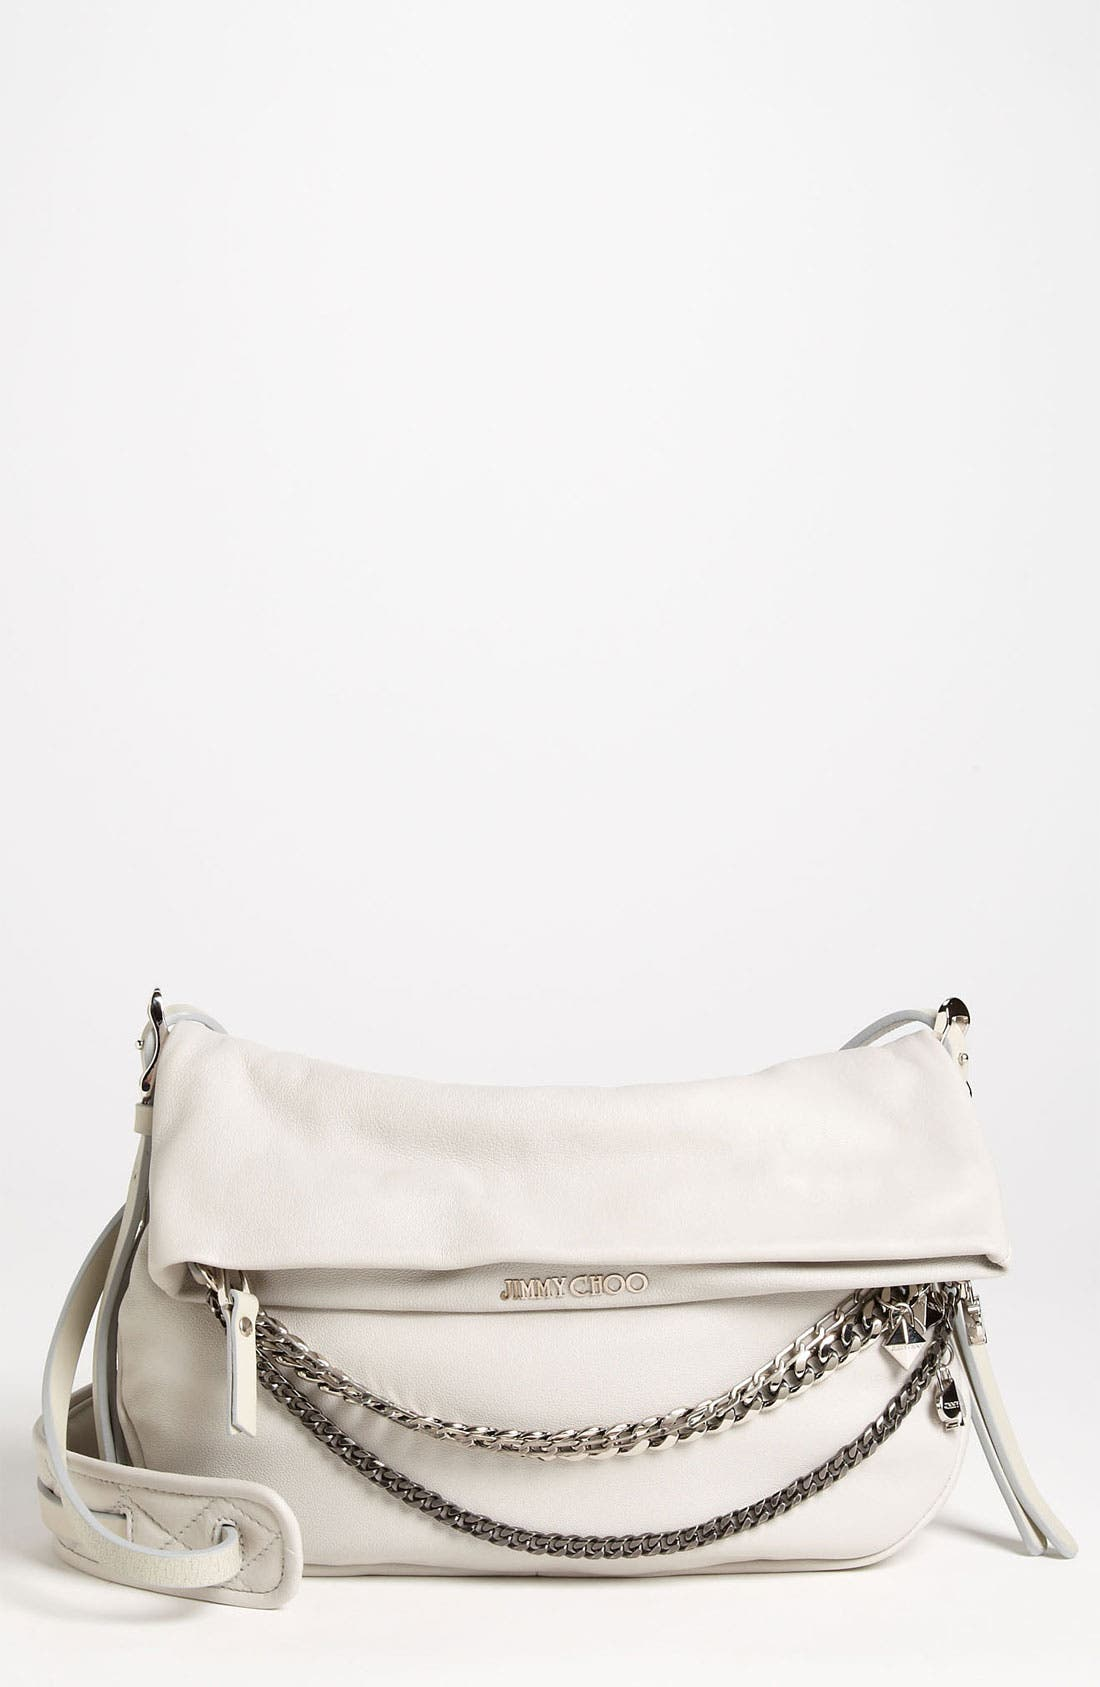 Alternate Image 1 Selected - Jimmy Choo 'Biker - Small' Leather Crossbody Bag